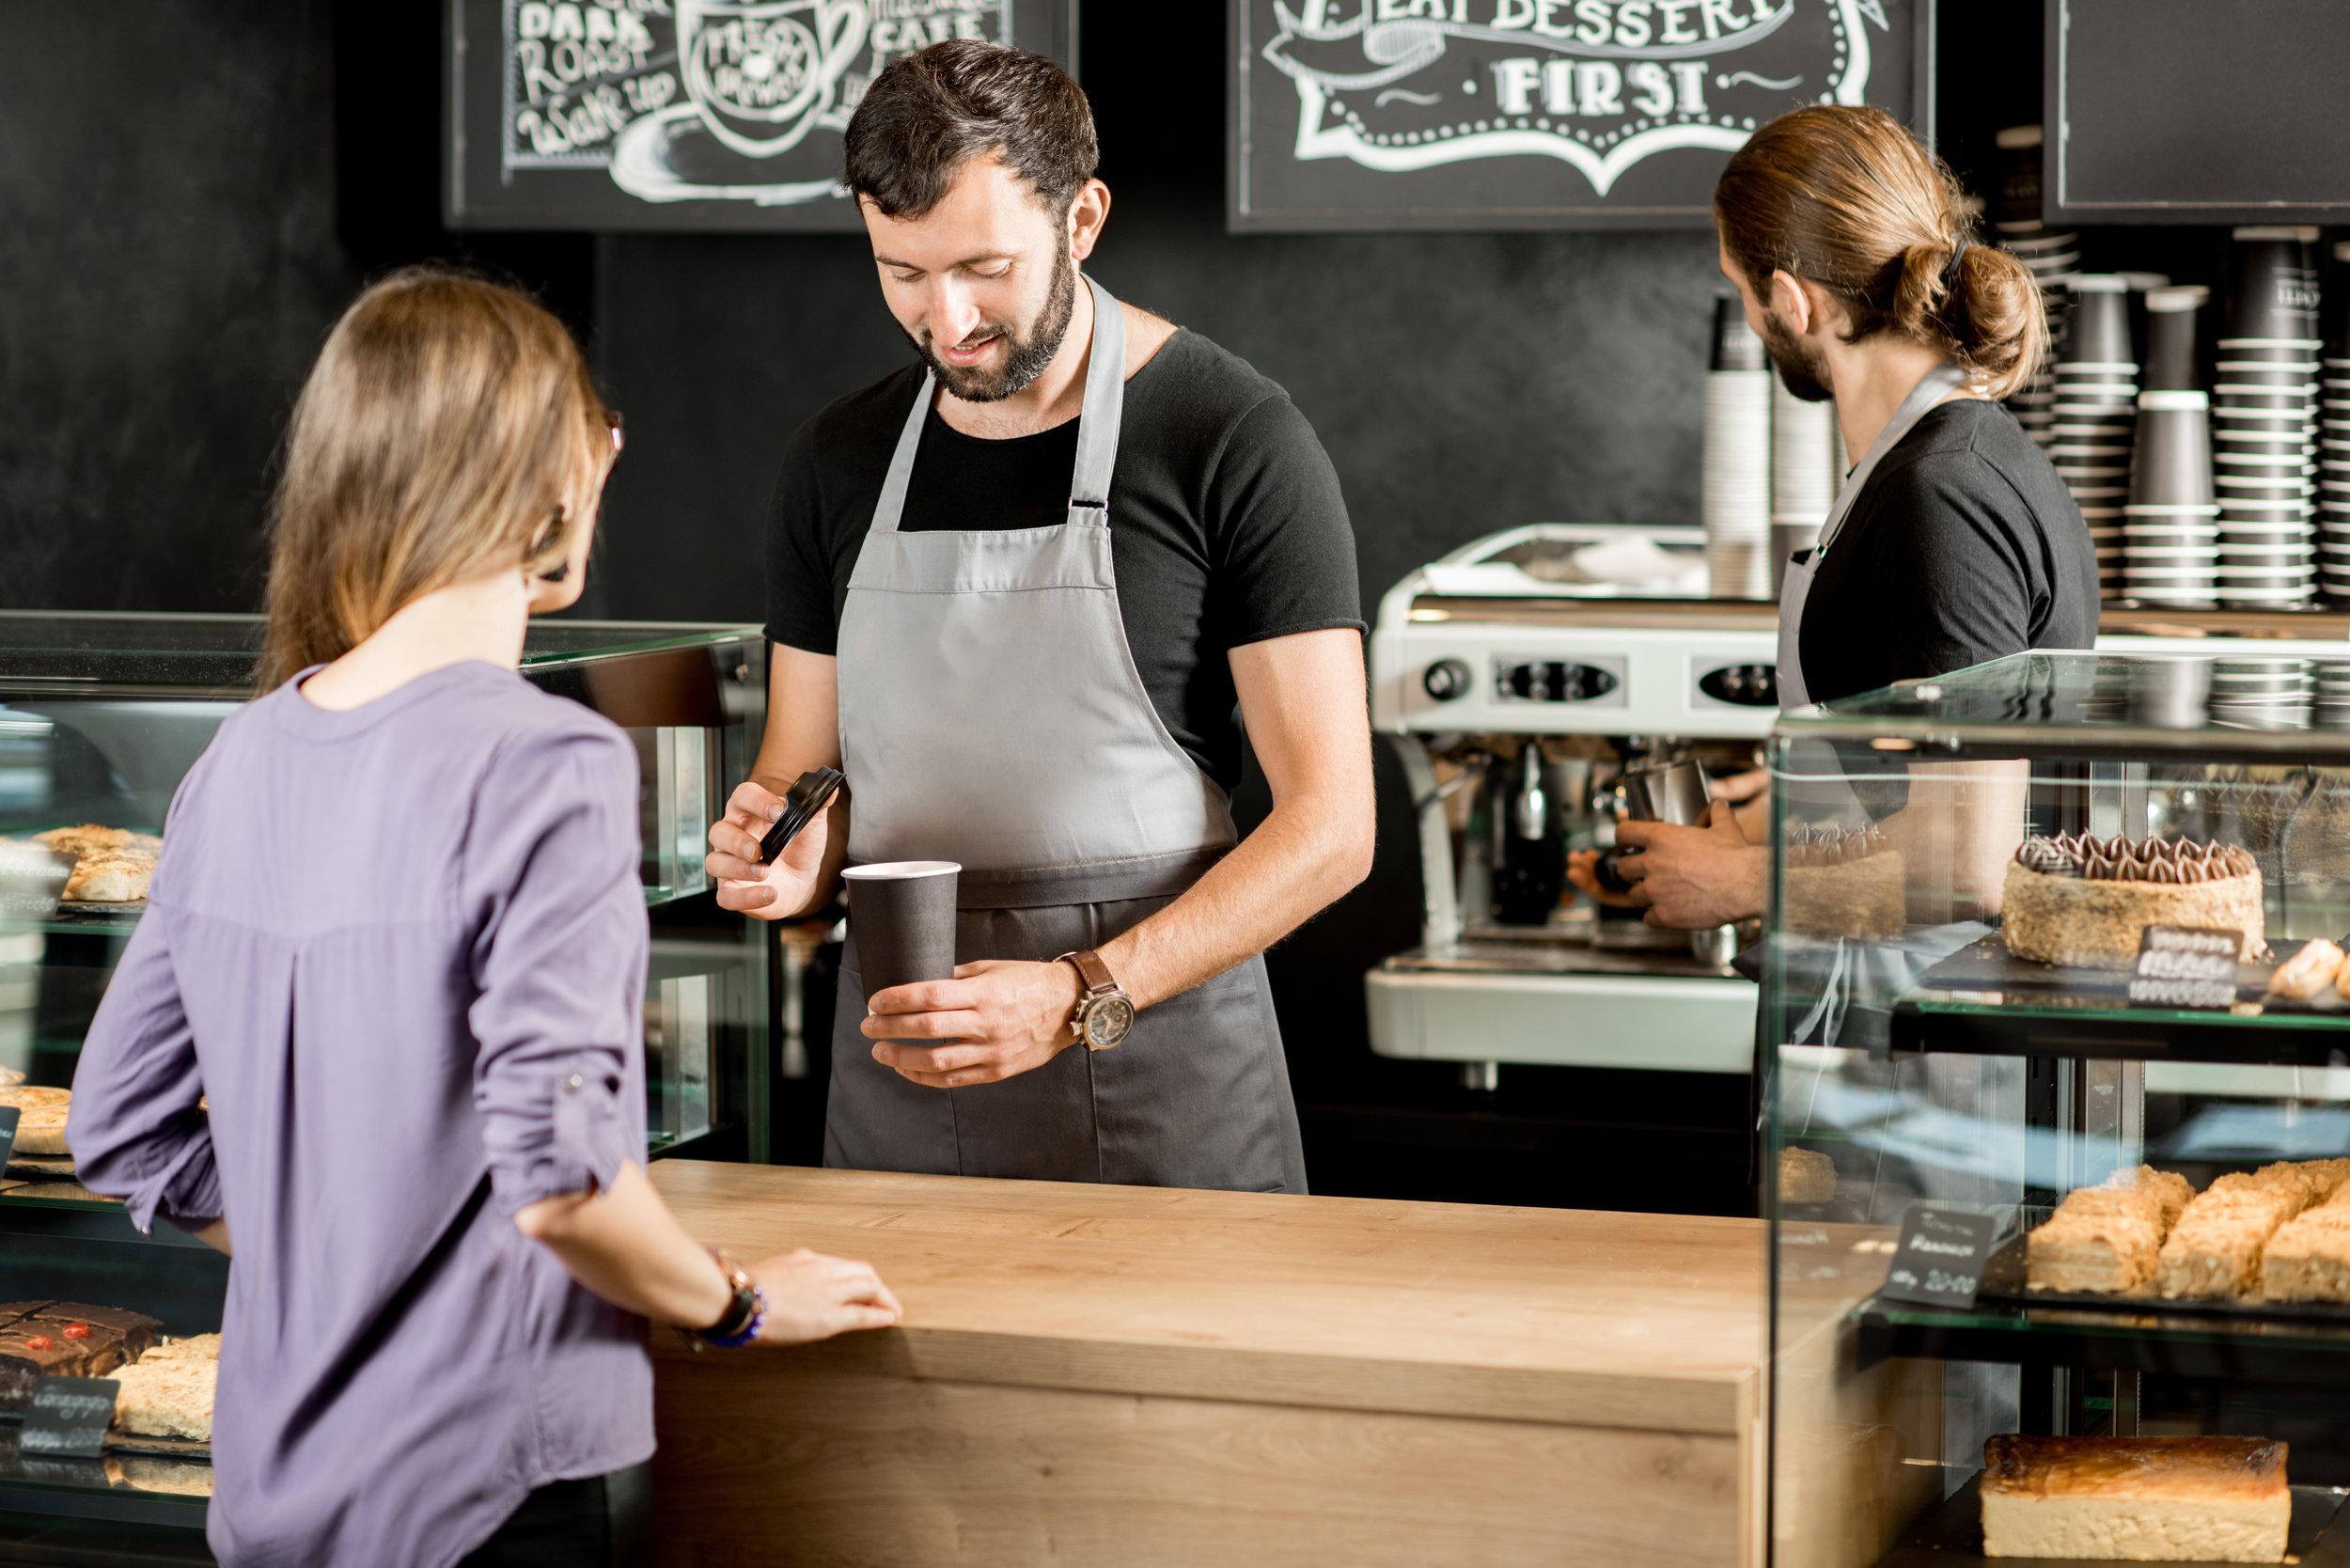 barista serving customer.jpeg